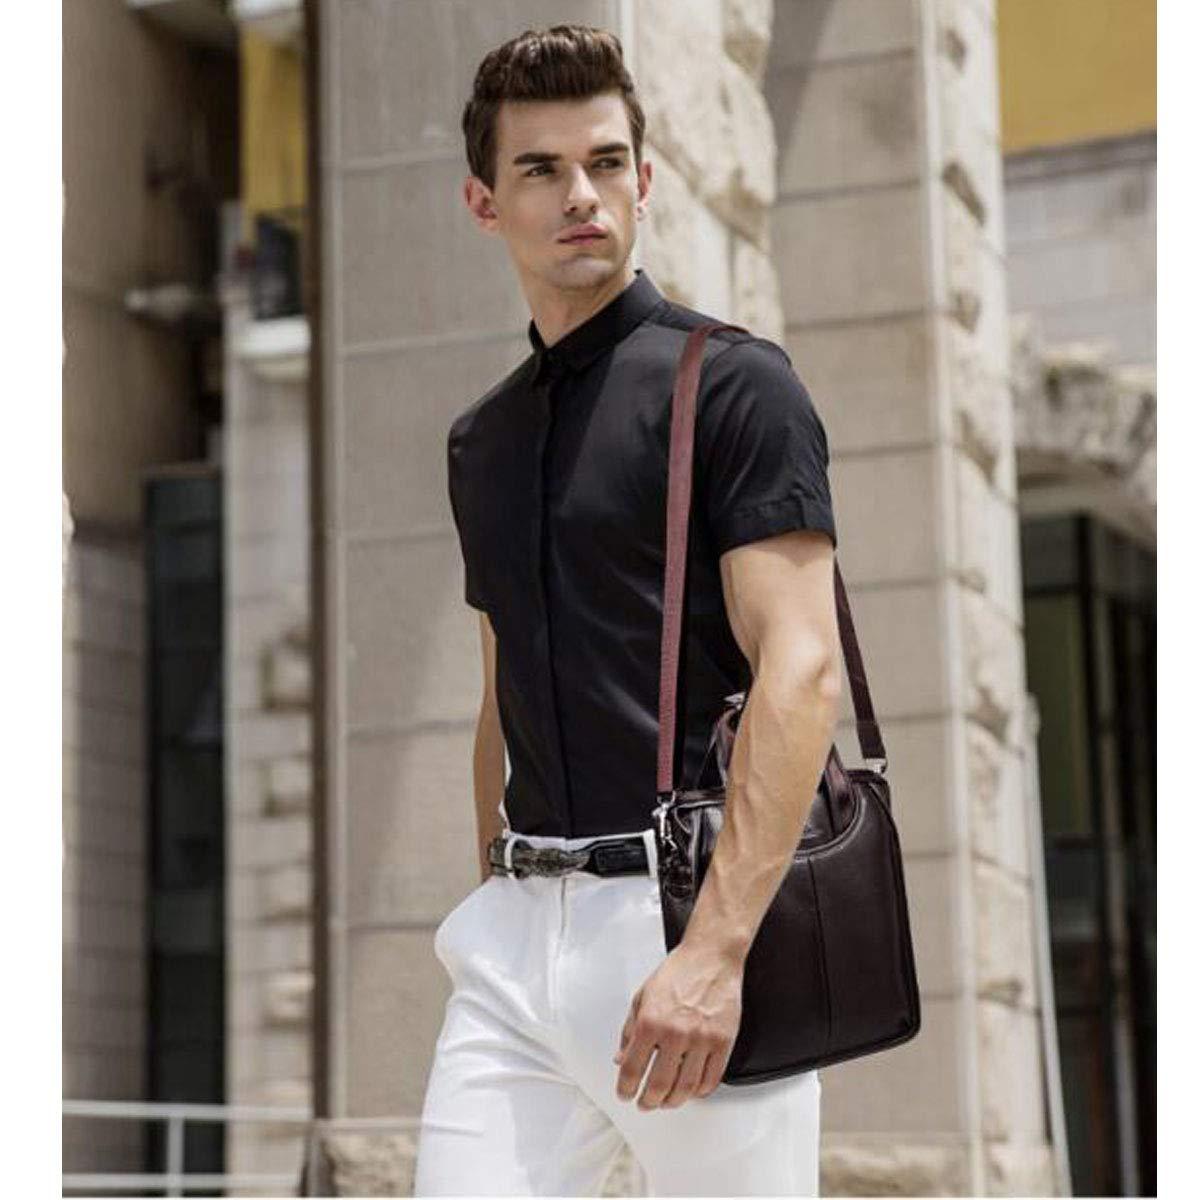 Portable Large-Capacity Leather Mens Bag Brown Yougou01 Briefcase Size: 279.531cm Quality Assured Color : Brown New Boutique Mens Handbag